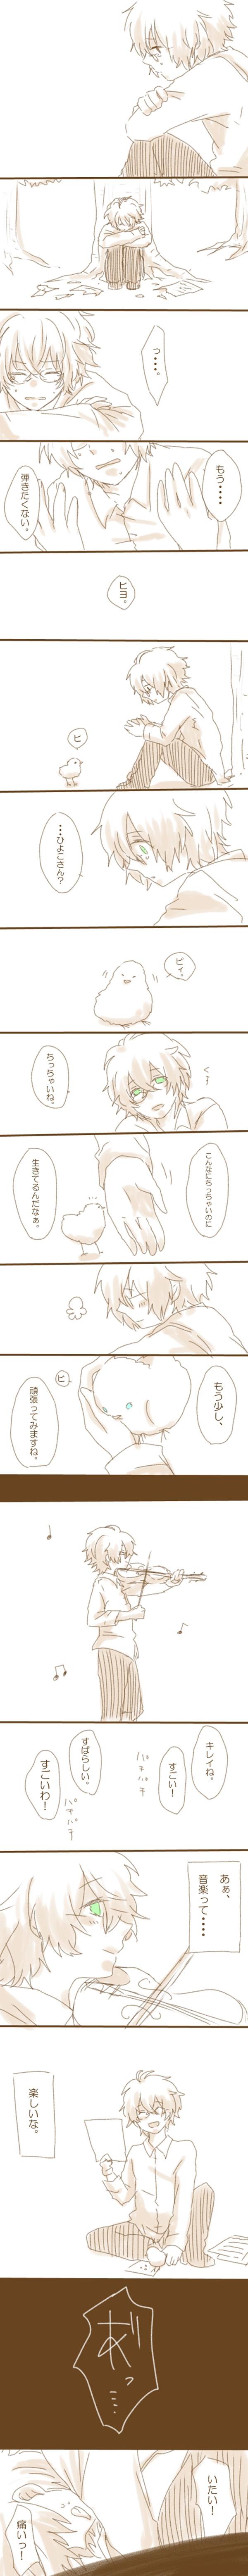 Tags: Anime, Pixiv Id 2071452, BROCCOLI, Uta no☆prince-sama♪, Shinomiya Natsuki, Chicken, Fanart, Pixiv, Comic, Princes Of Song